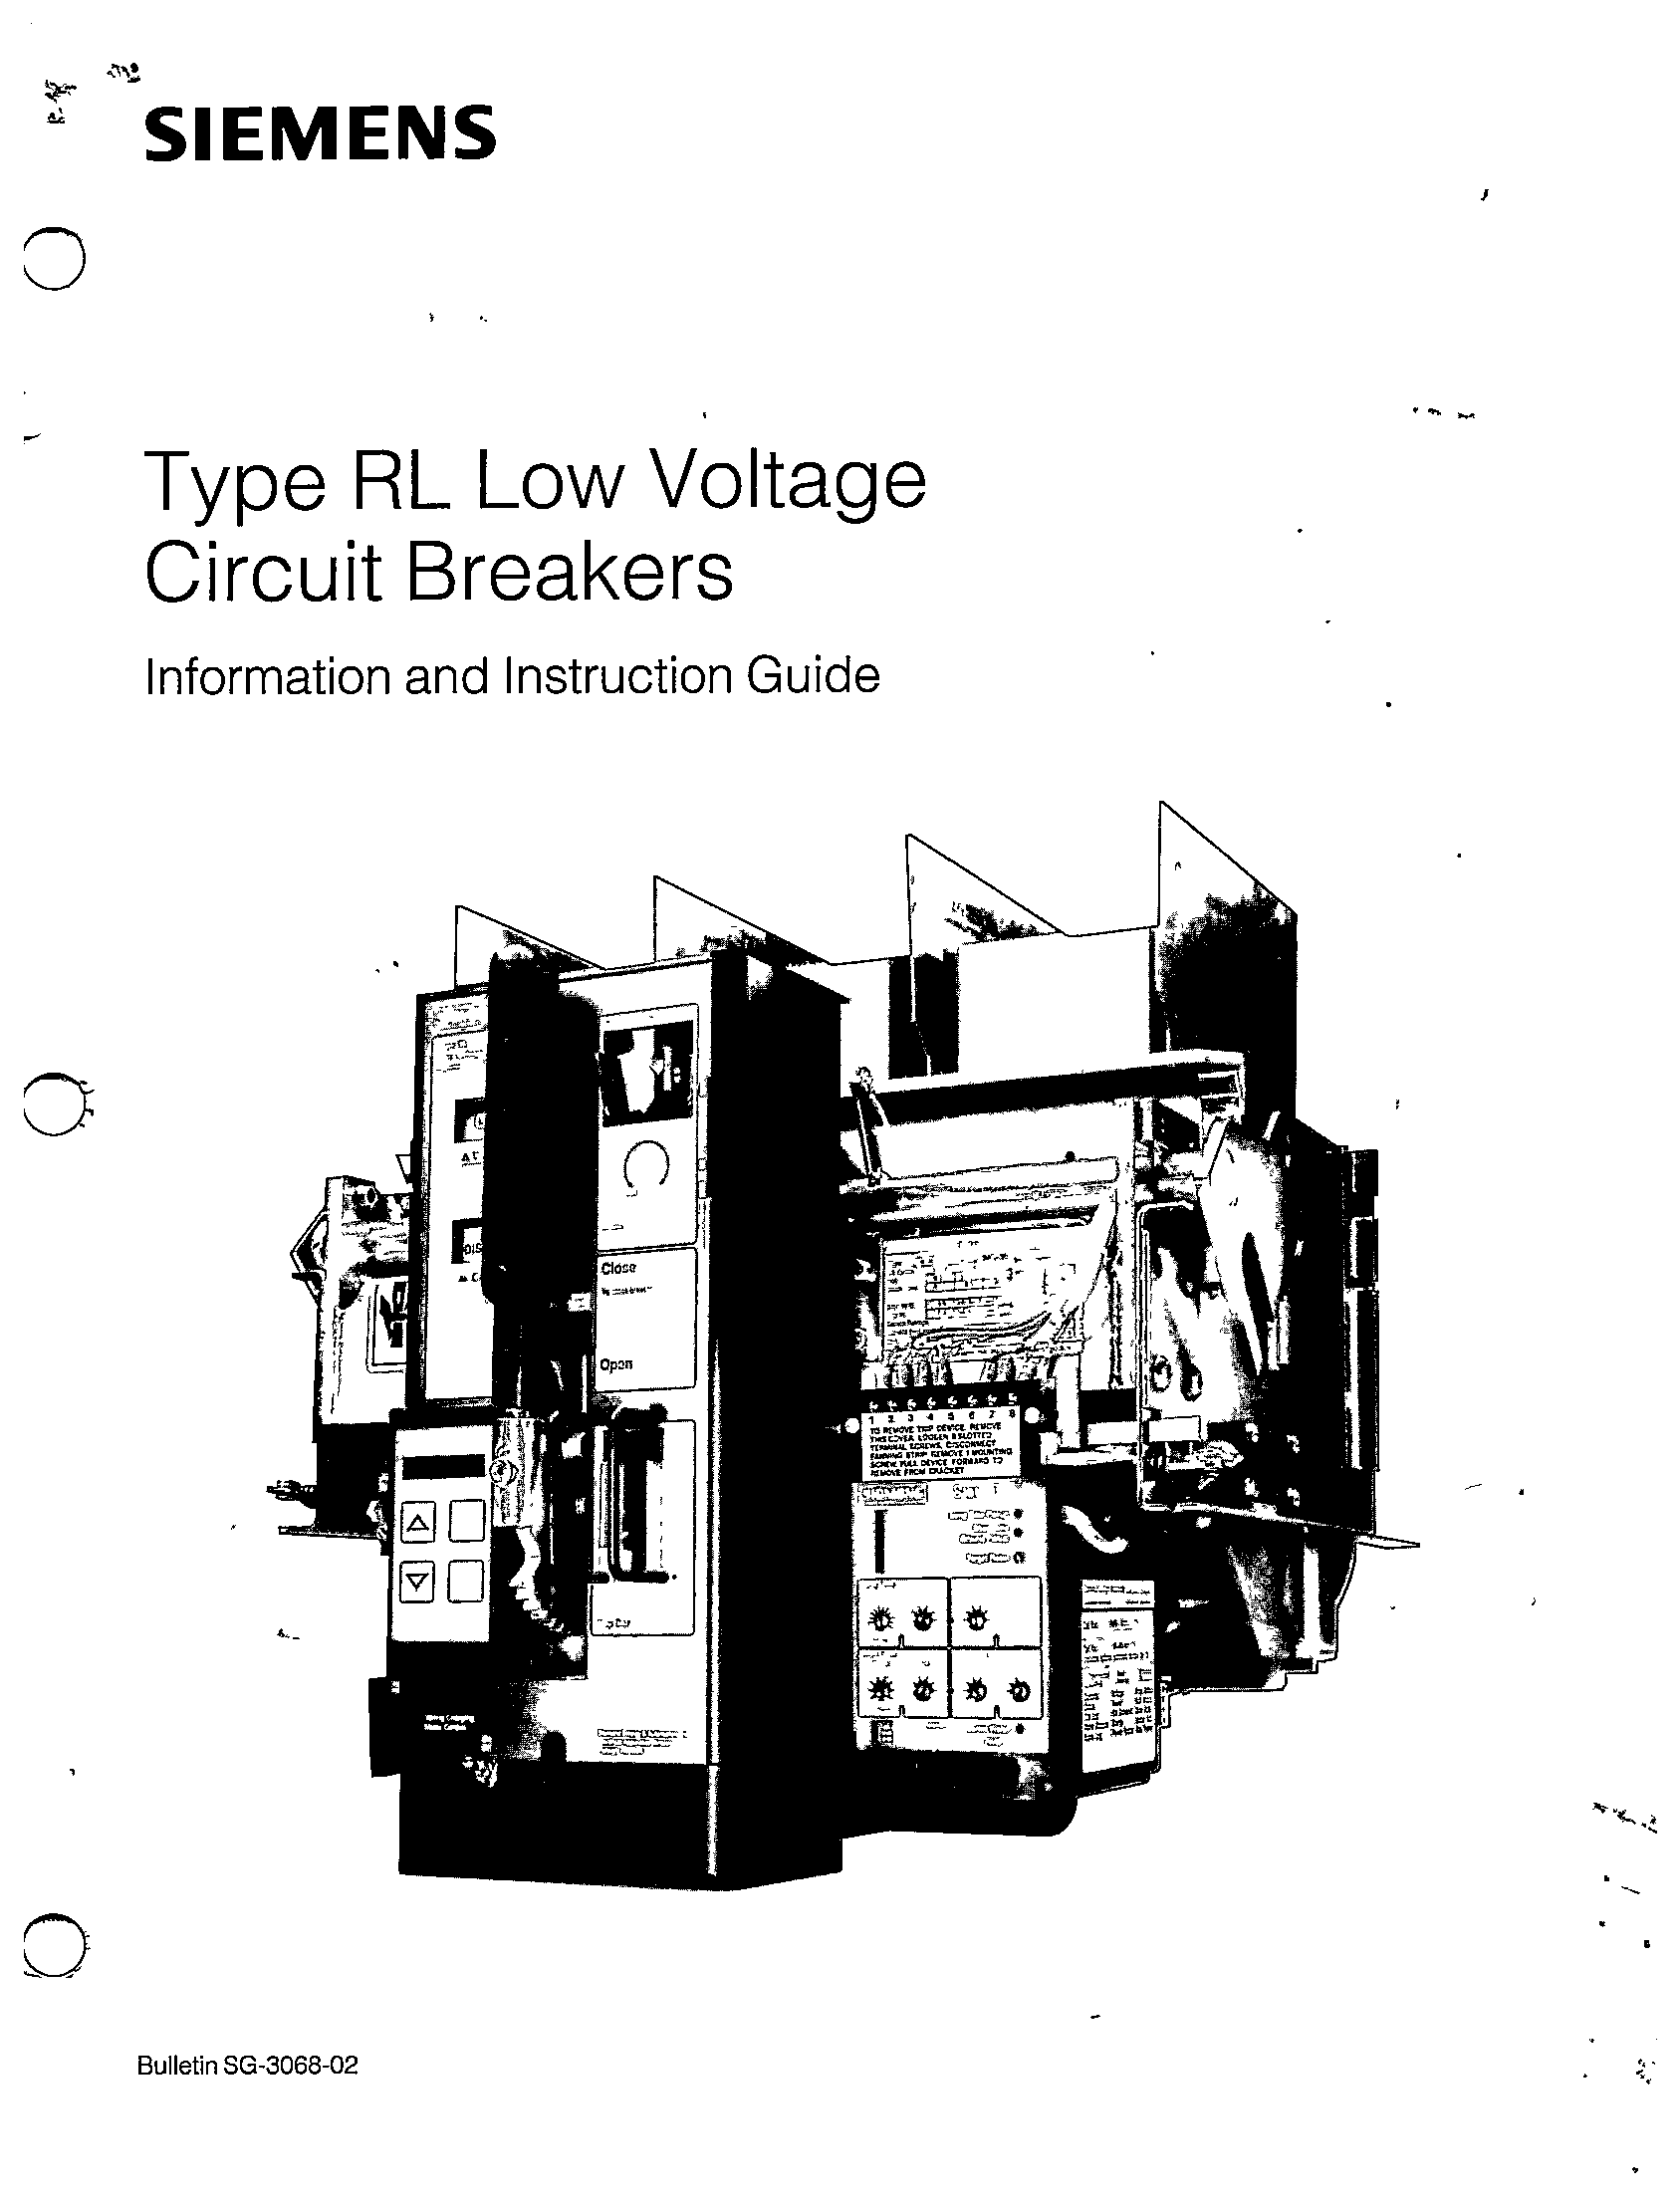 SG-3068-02 TYPE RL LOW VOLTAGE CIRCUIT BREAKERS MANUAL